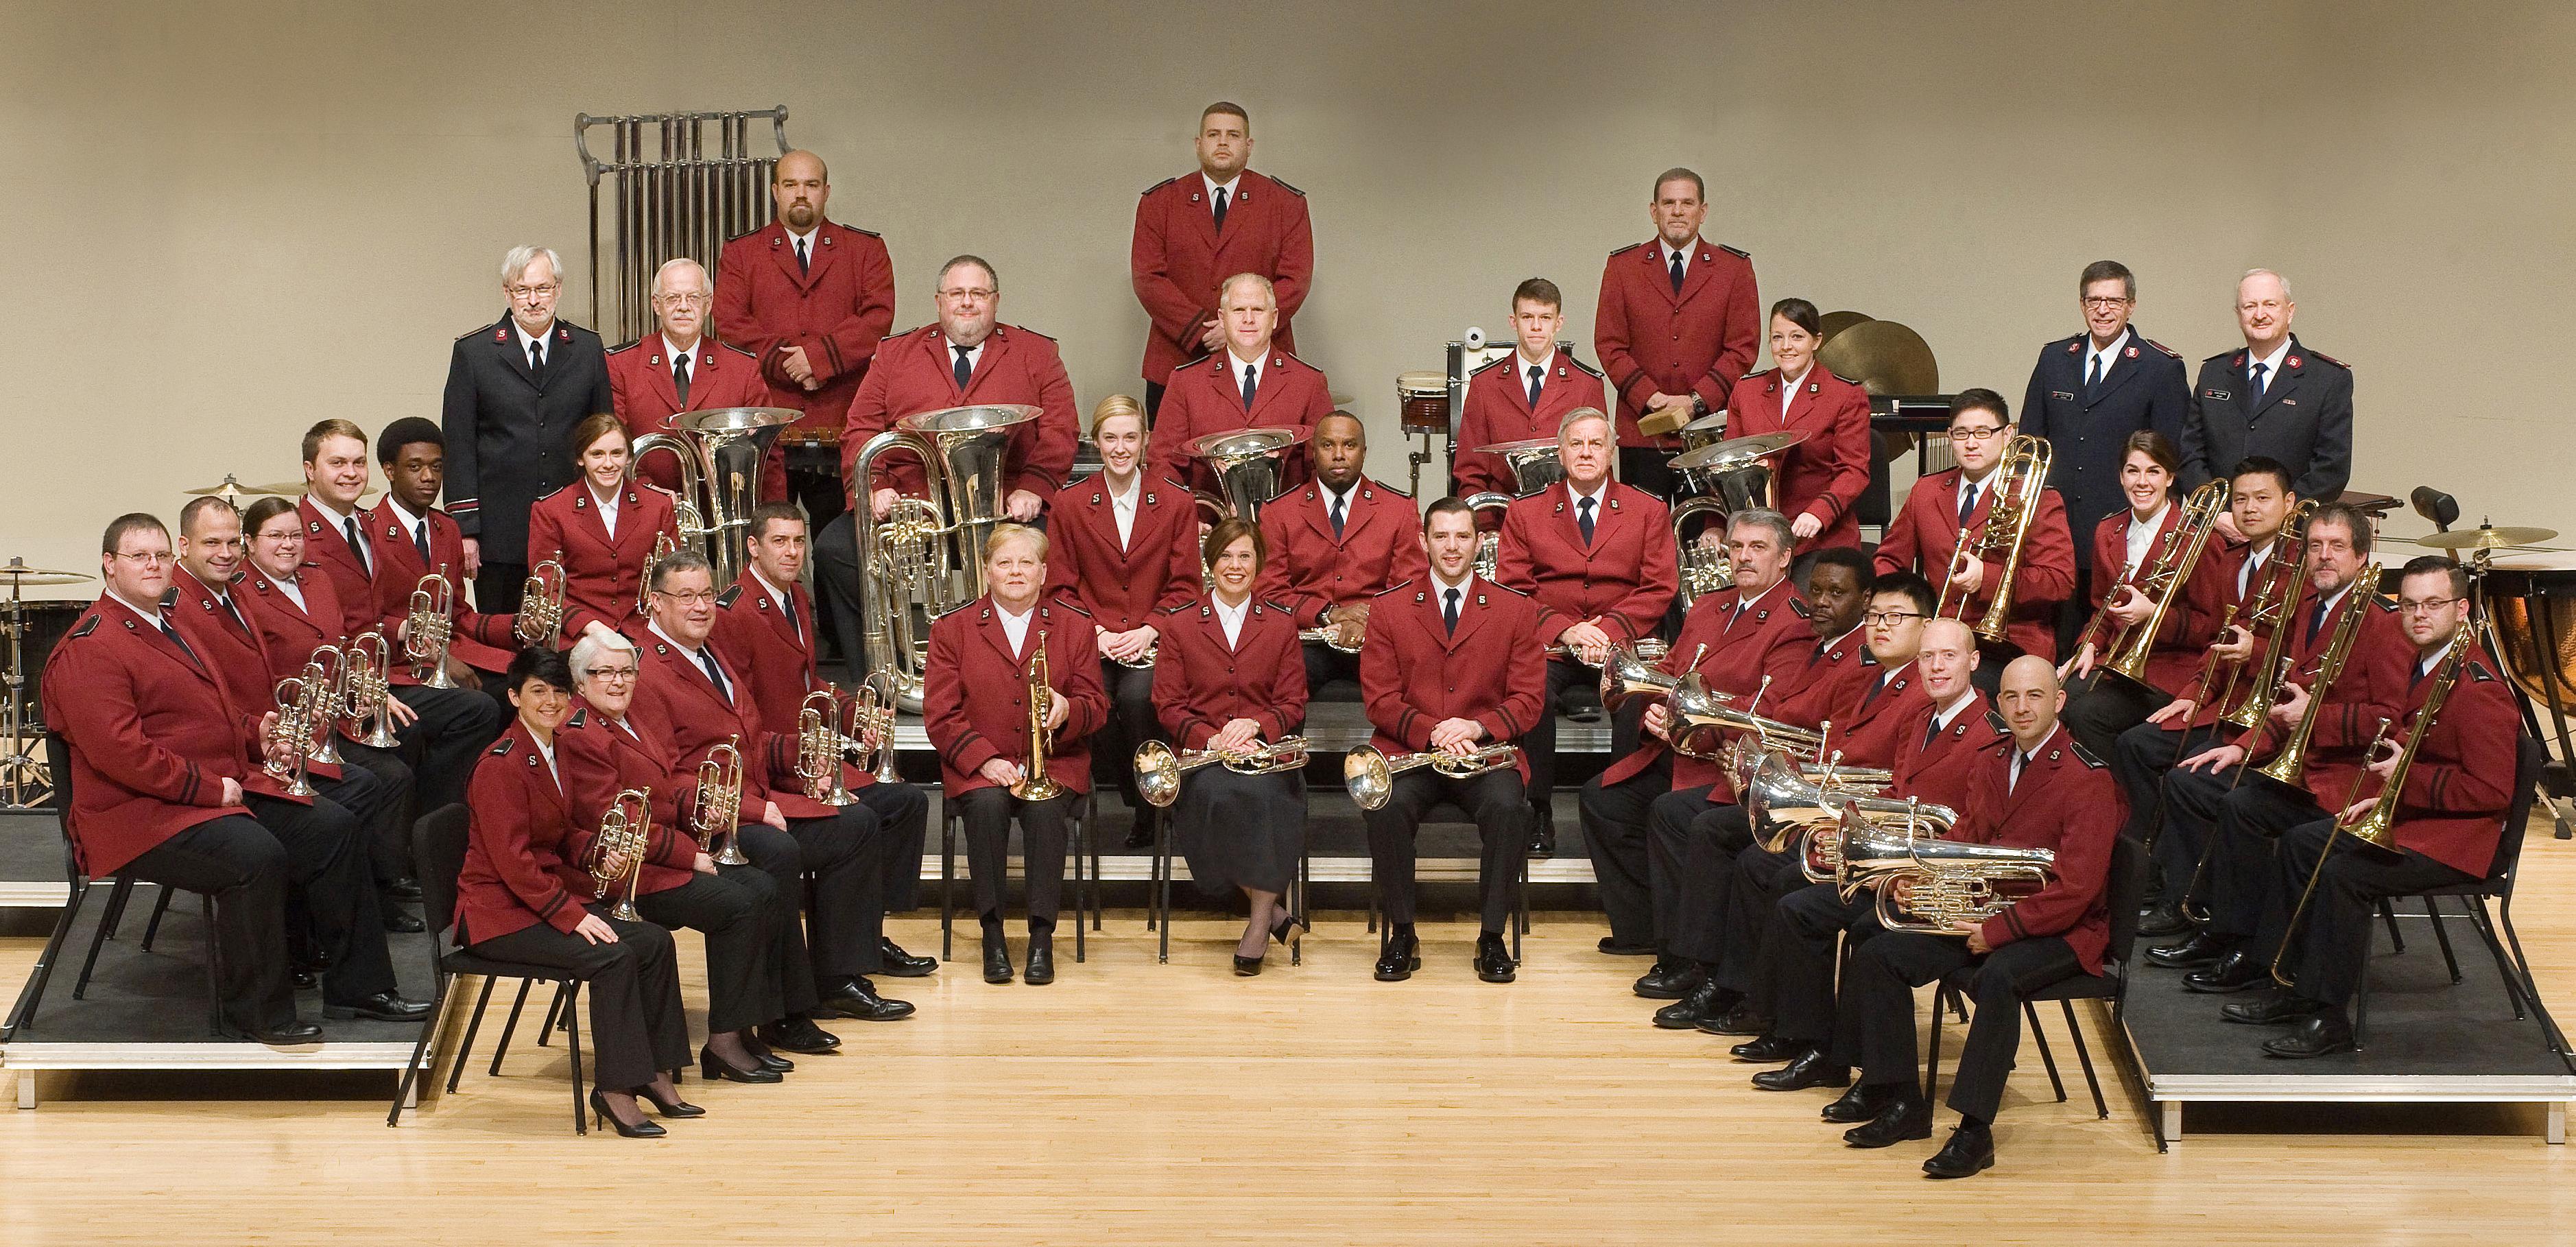 Chicago Staff Band